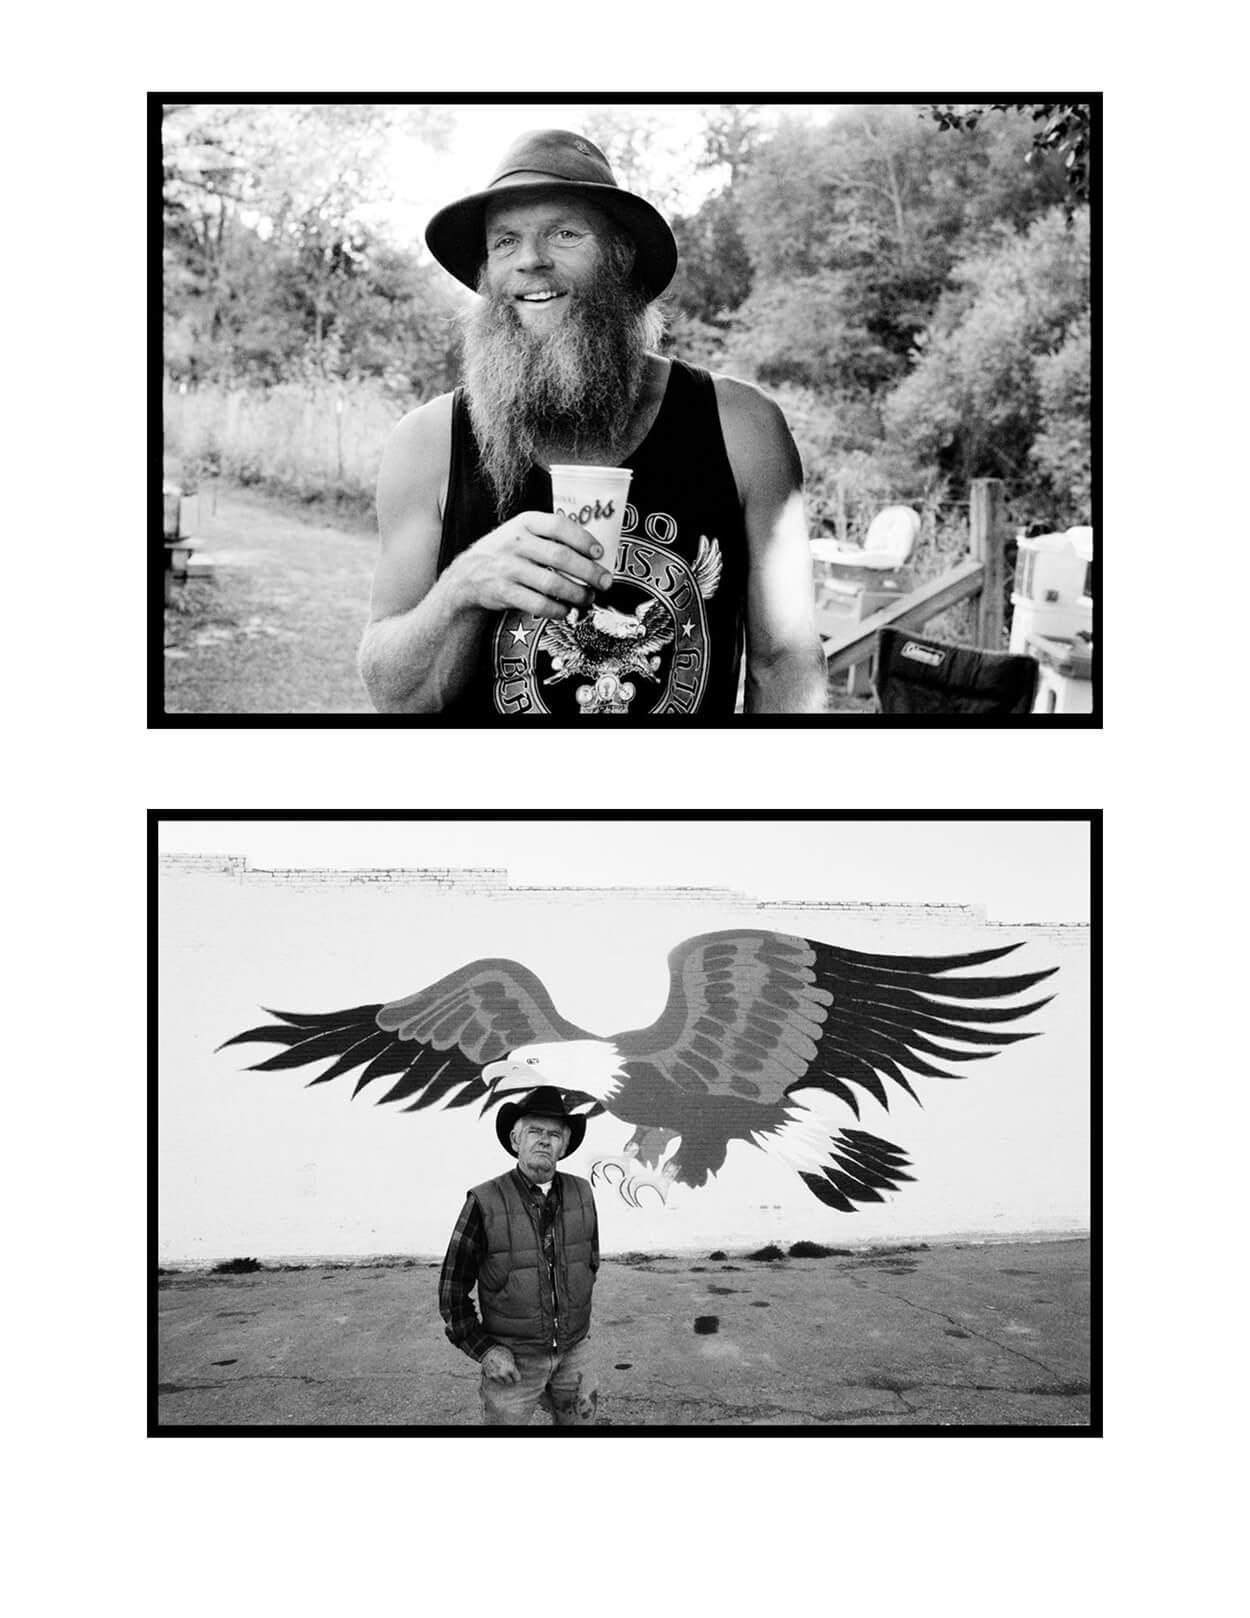 Hunter Barnes documents America's fringe communities in Roadbook - Popular Photography - Popular Photography - Page 8